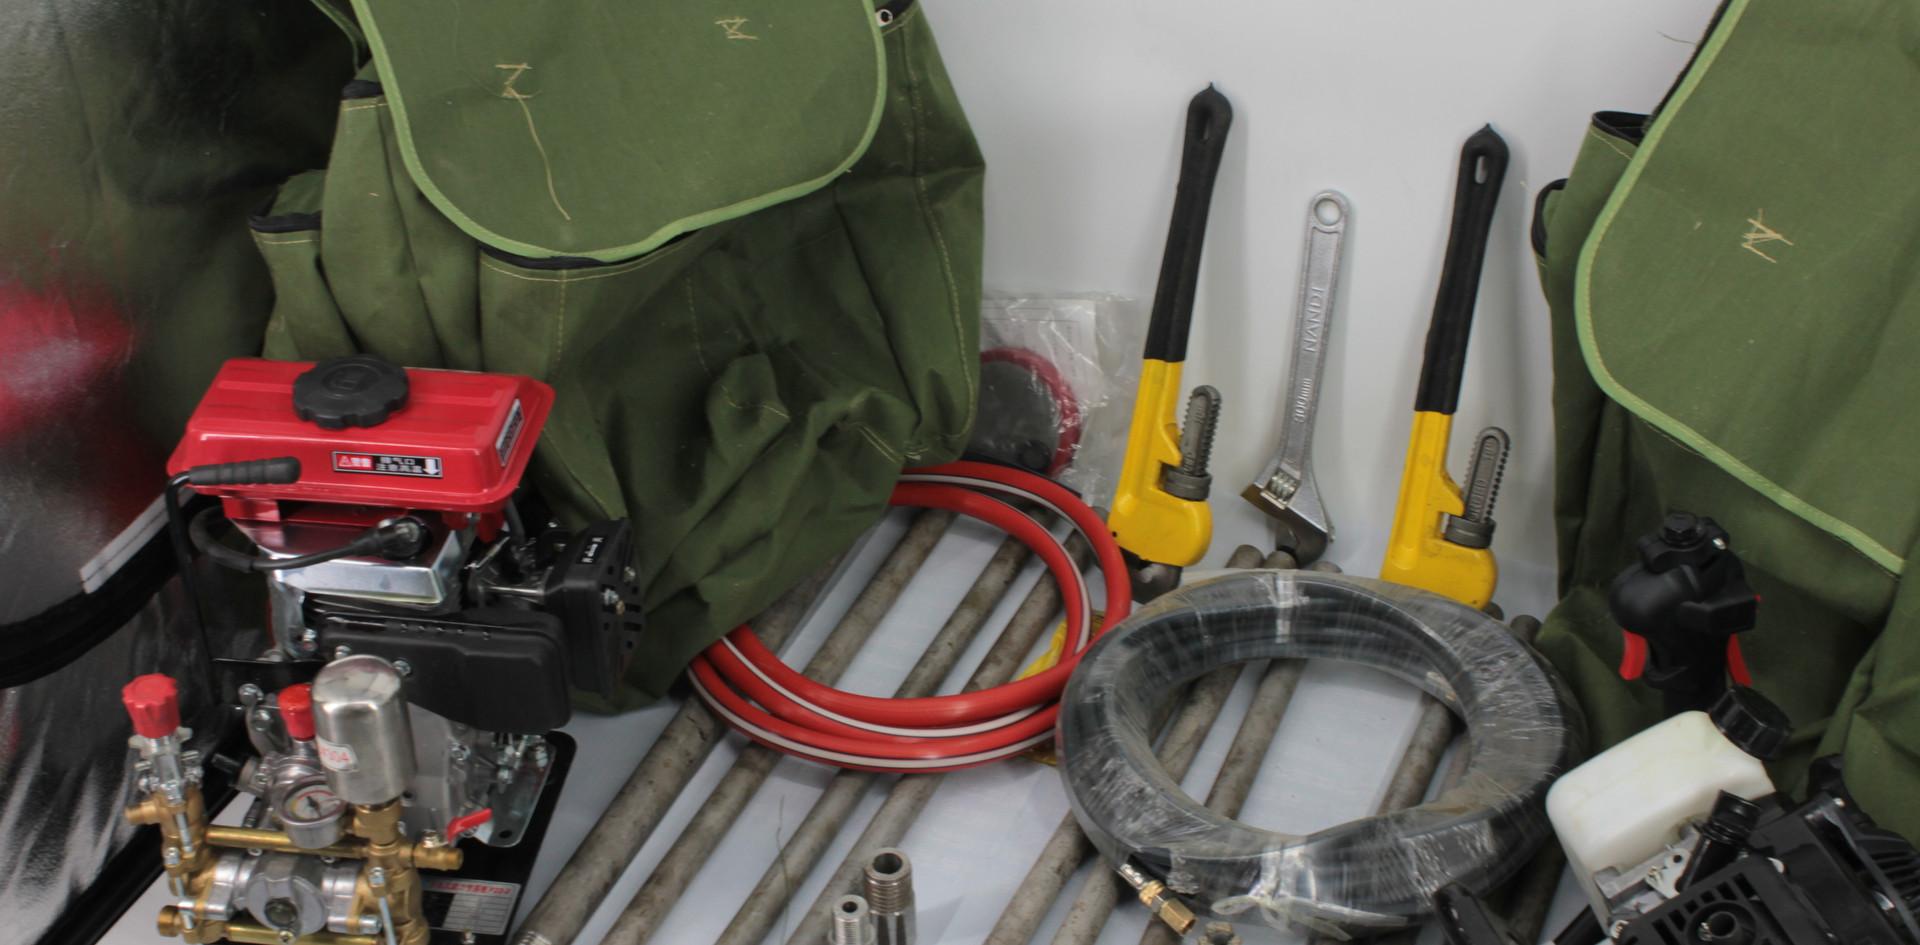 Backpack portable drilling and soil samp